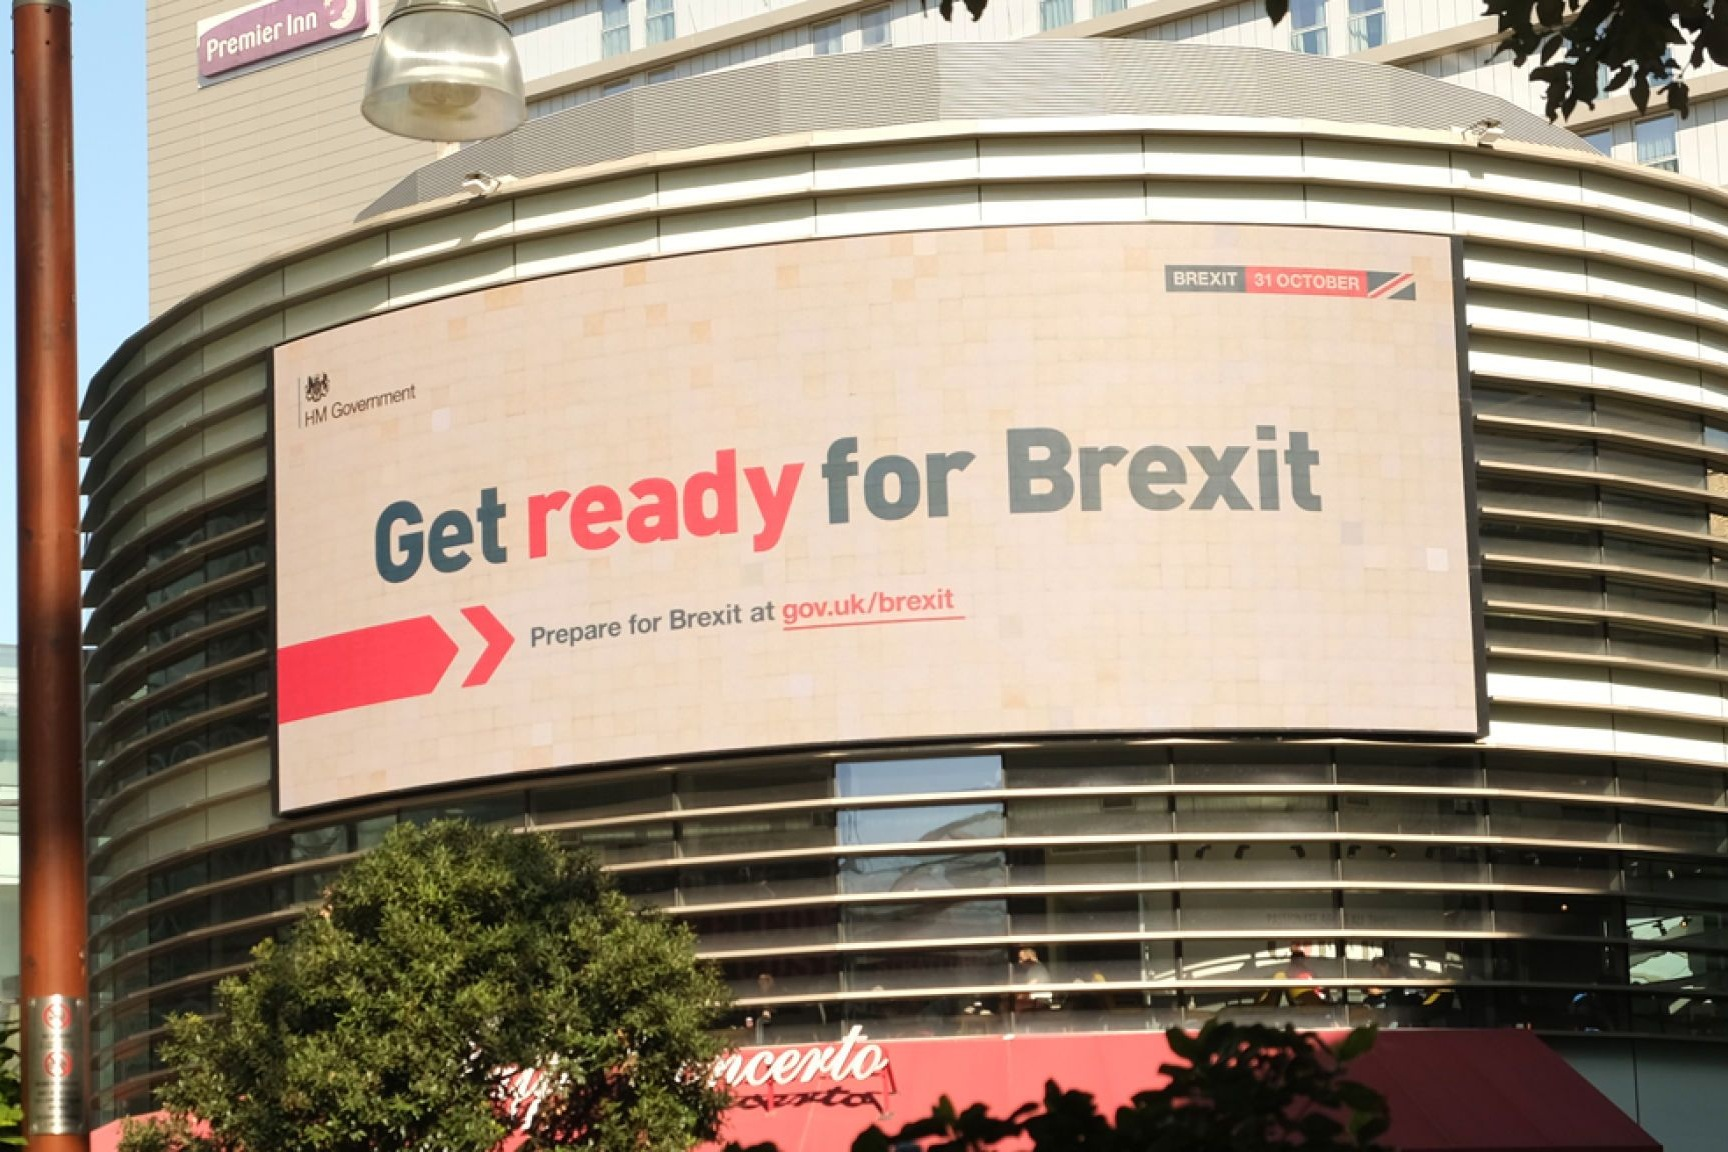 skynews-brexit-get-ready-for-brexit_4761896.jpg